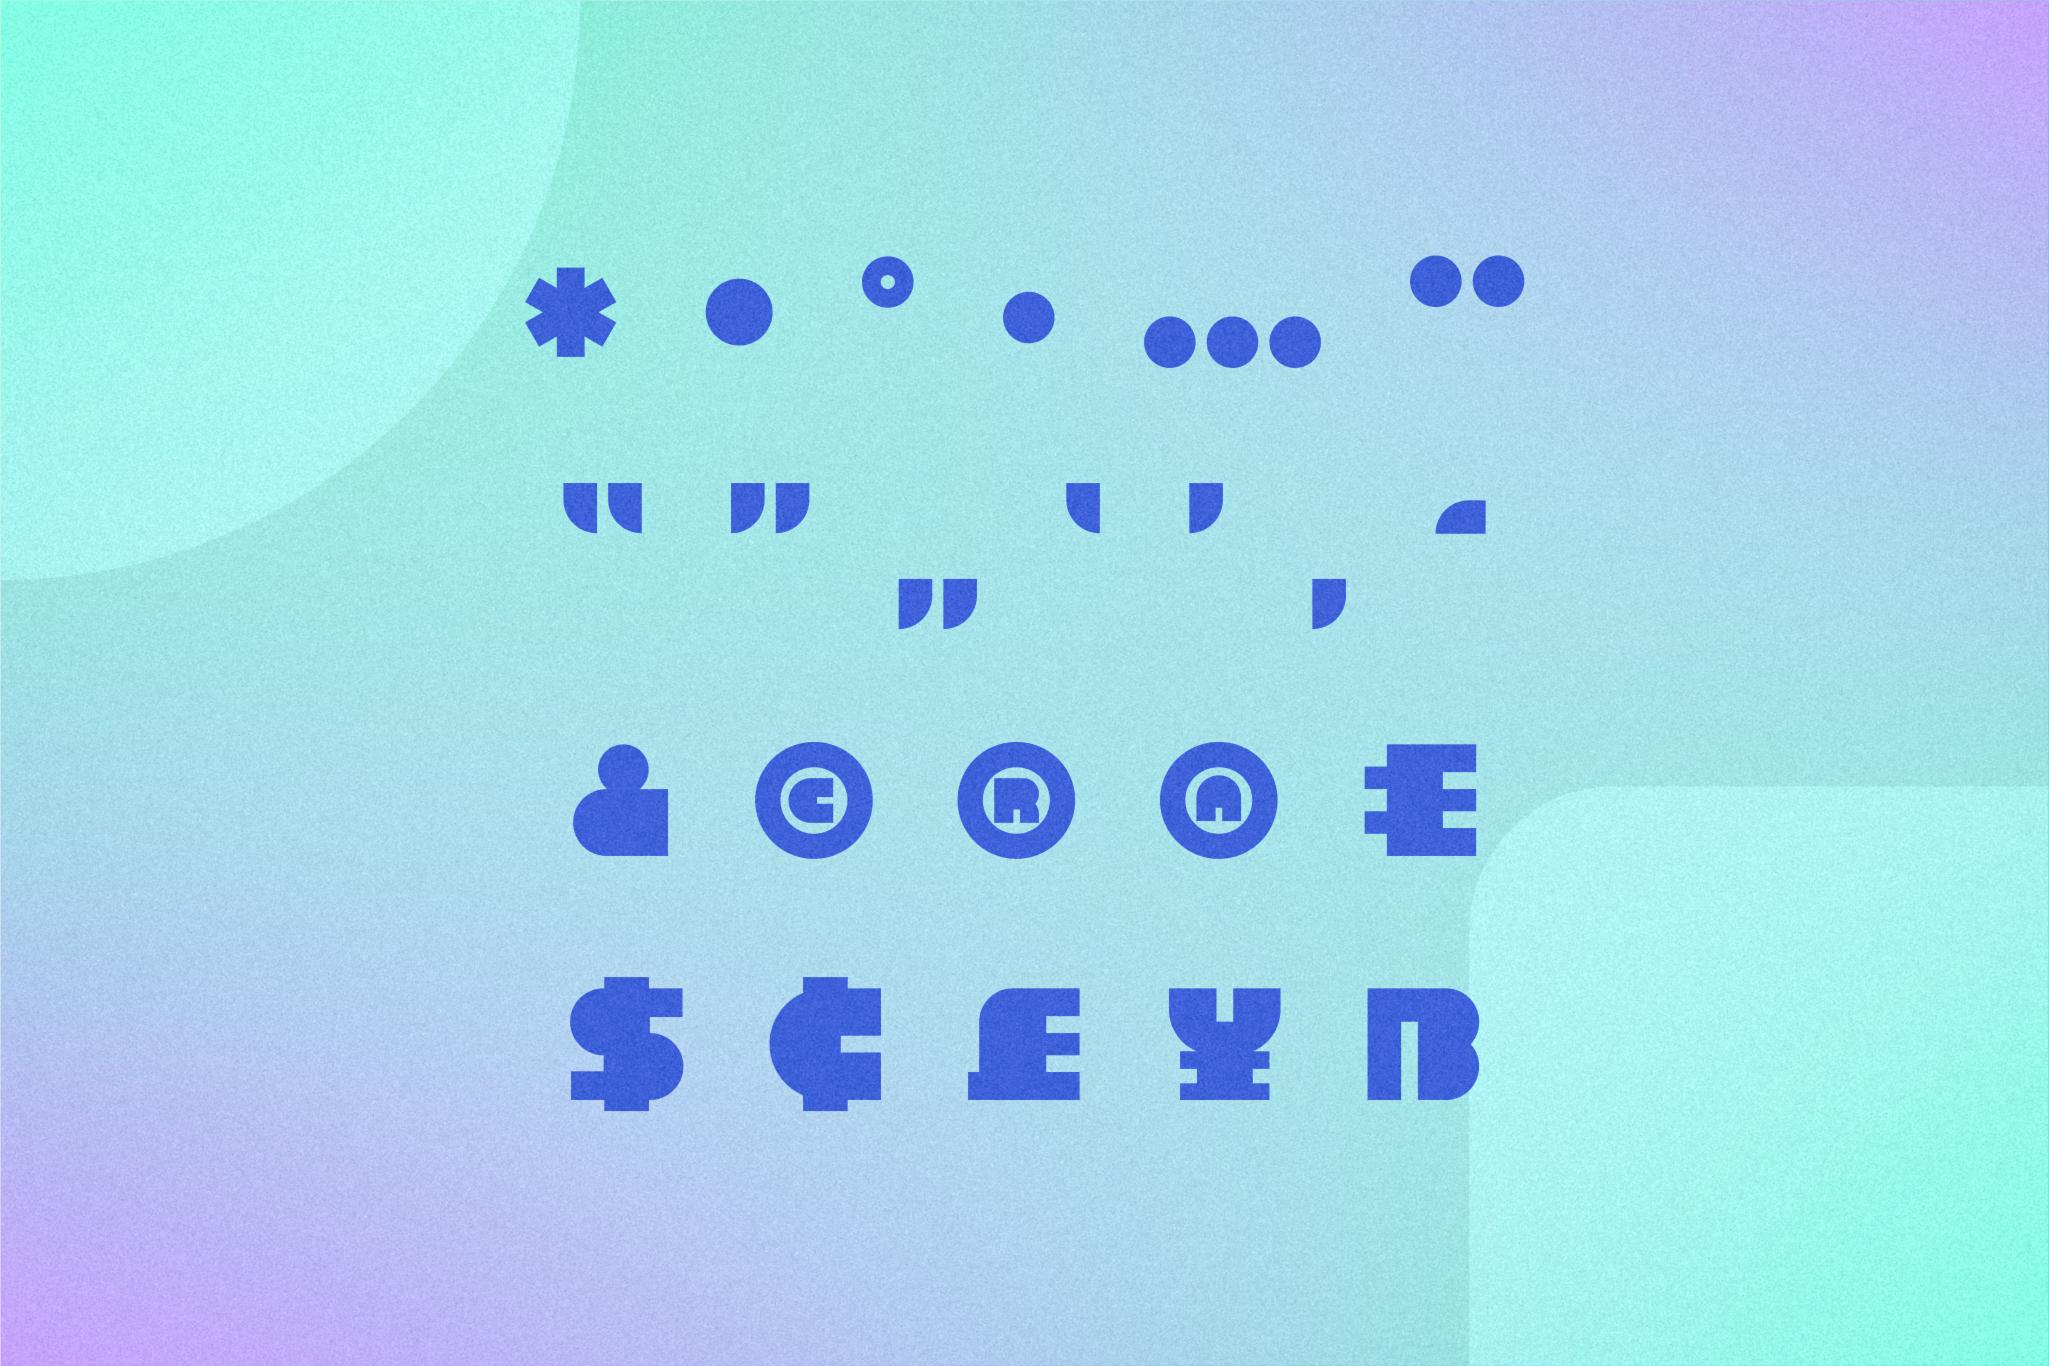 SQUAROUND S example image 8